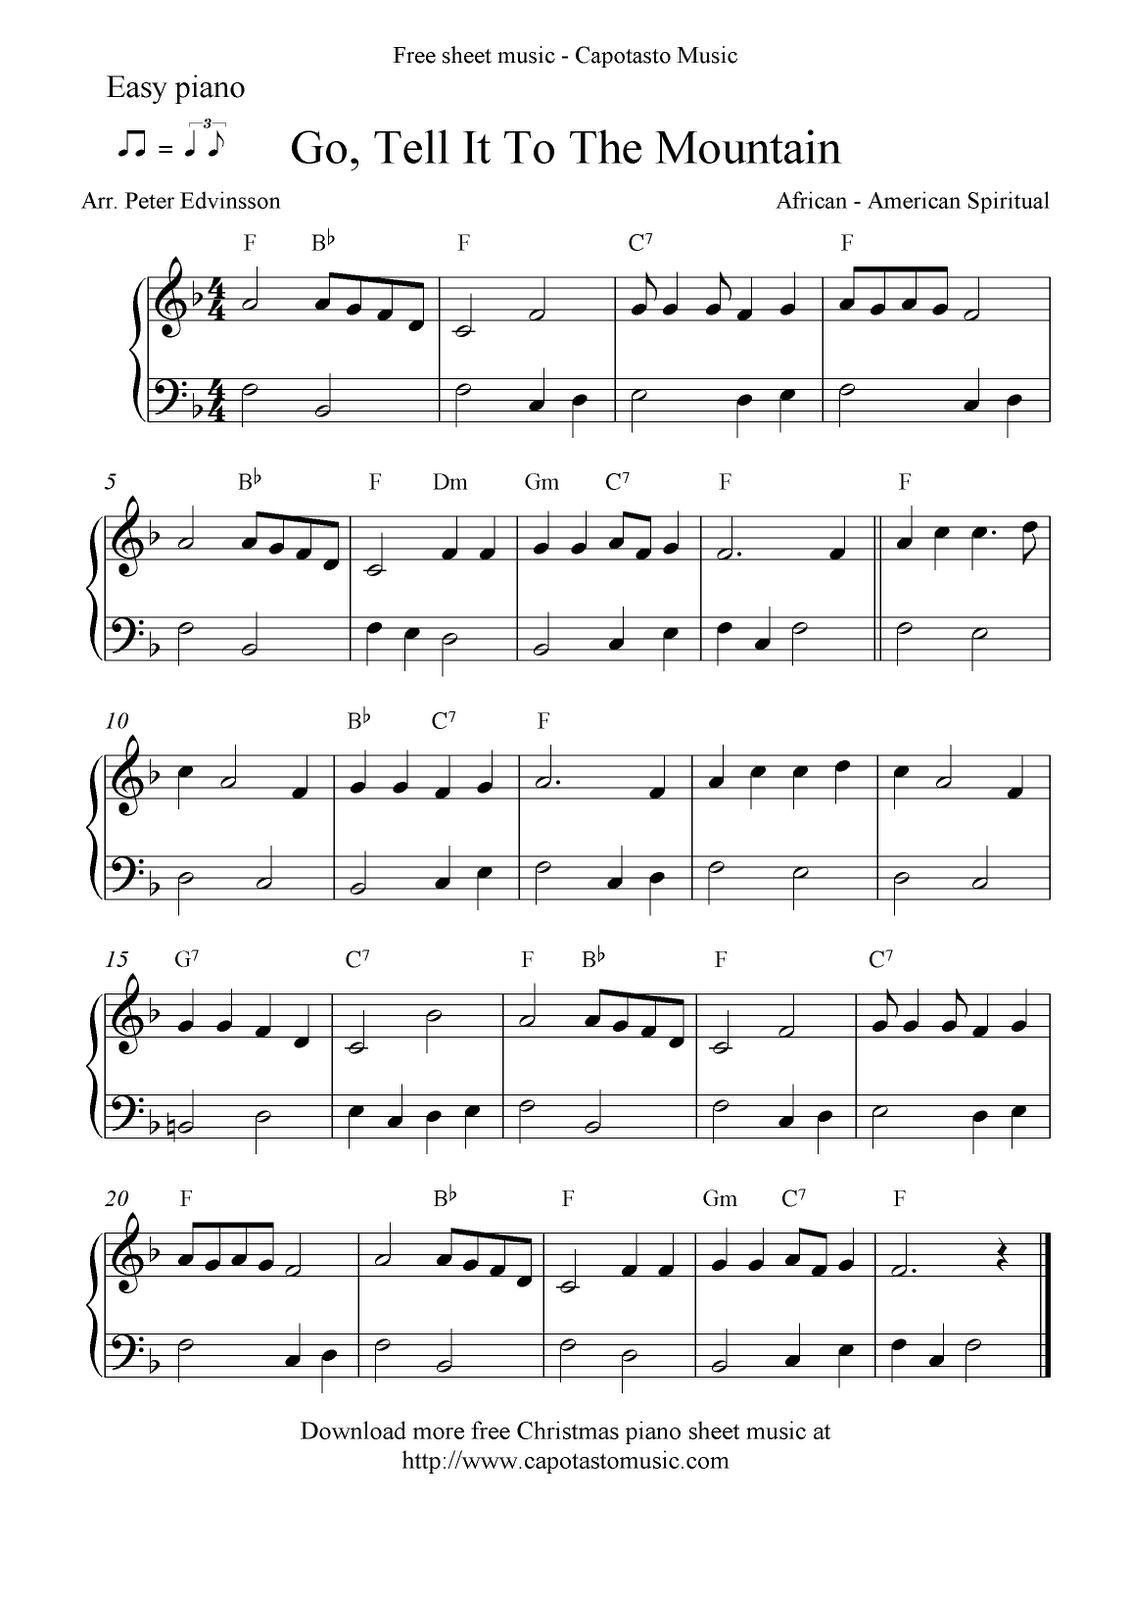 Free Printable Piano Sheet Music | Free Sheet Music Scores: Easy - Christmas Songs Piano Sheet Music Free Printable